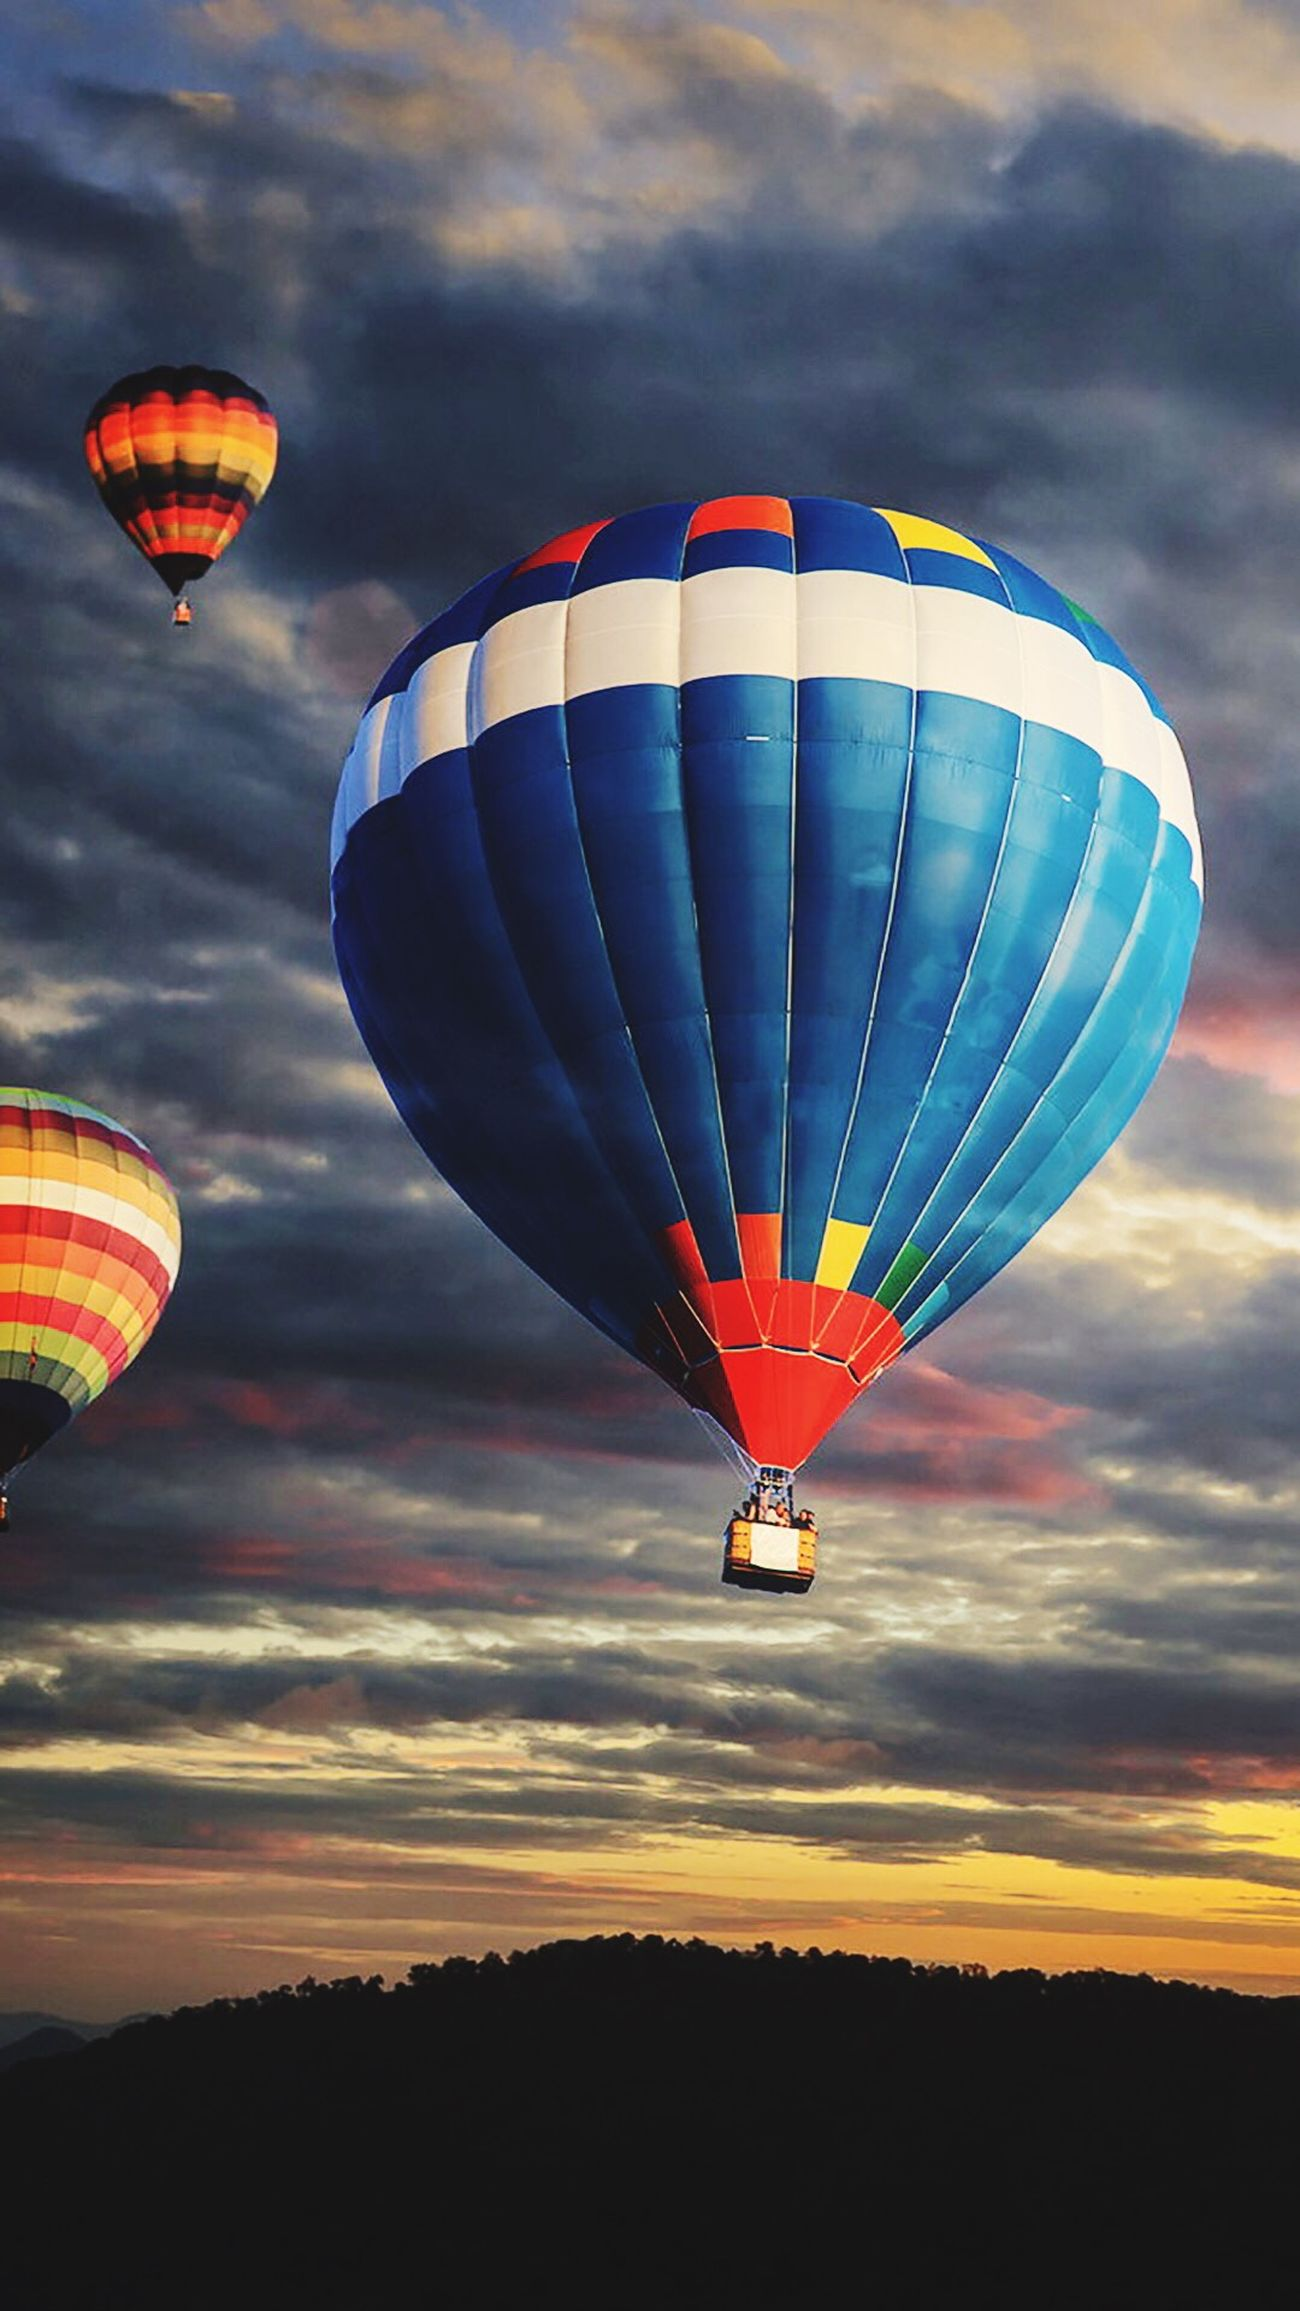 Sky Sunset Taking Photos Hot-air Balloon Beautiful Day